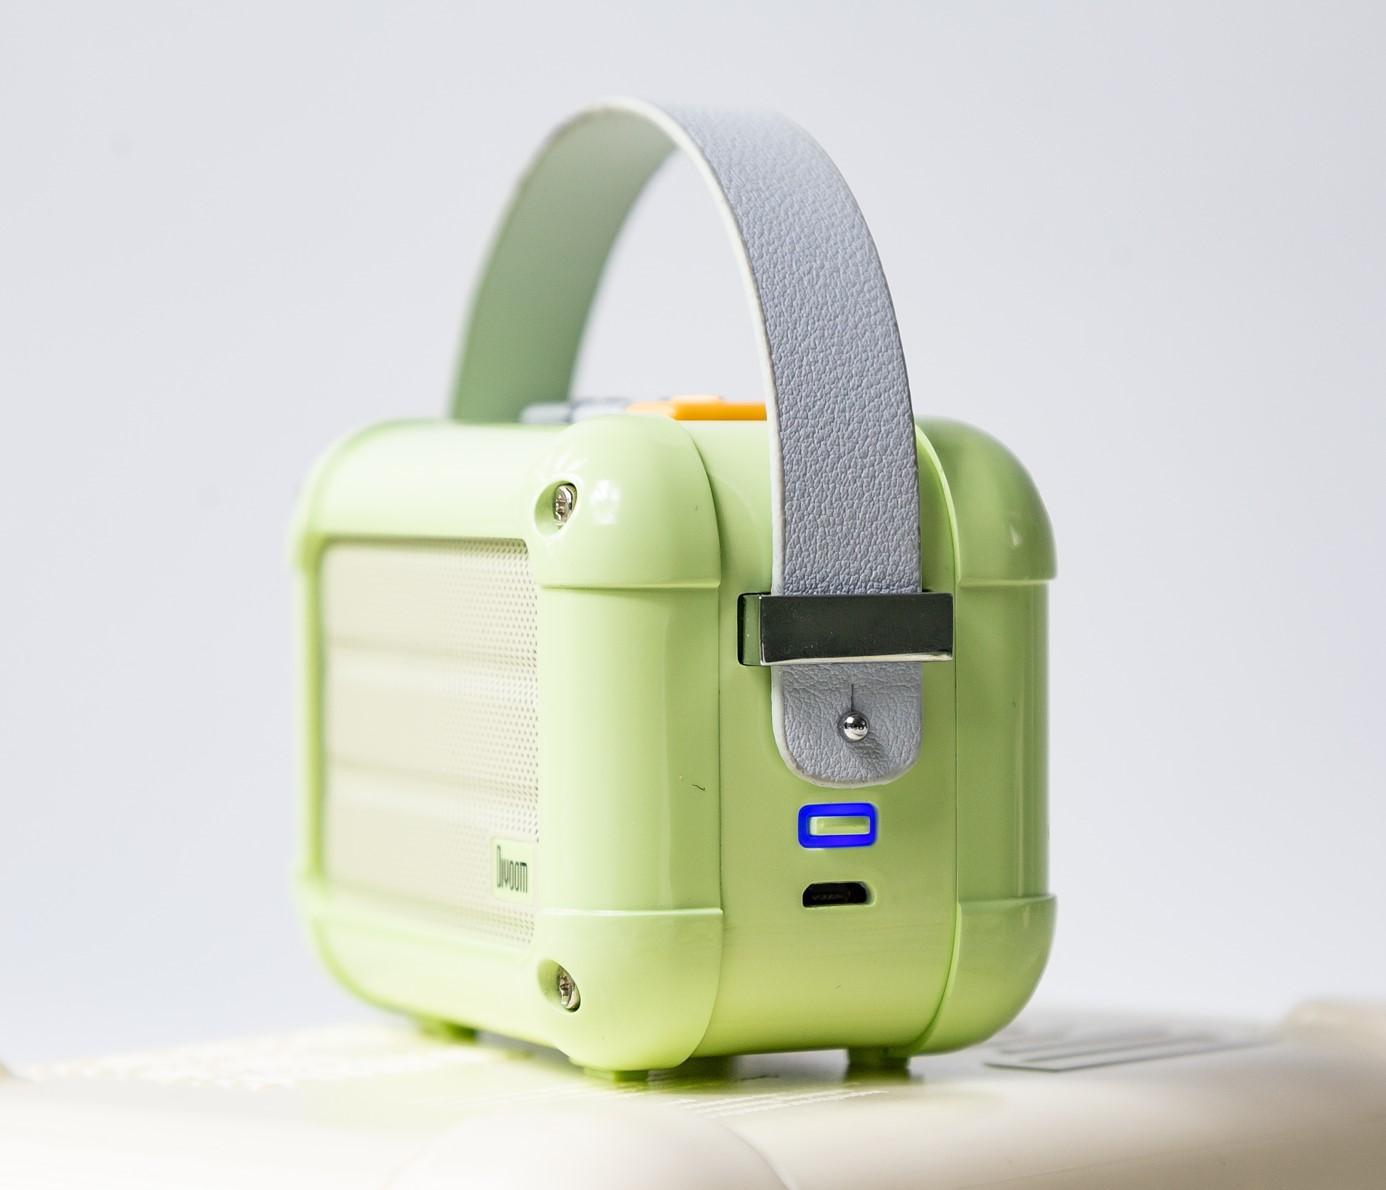 Loa-Bluetooth-Loa-Macchiato-Xanh-la-3